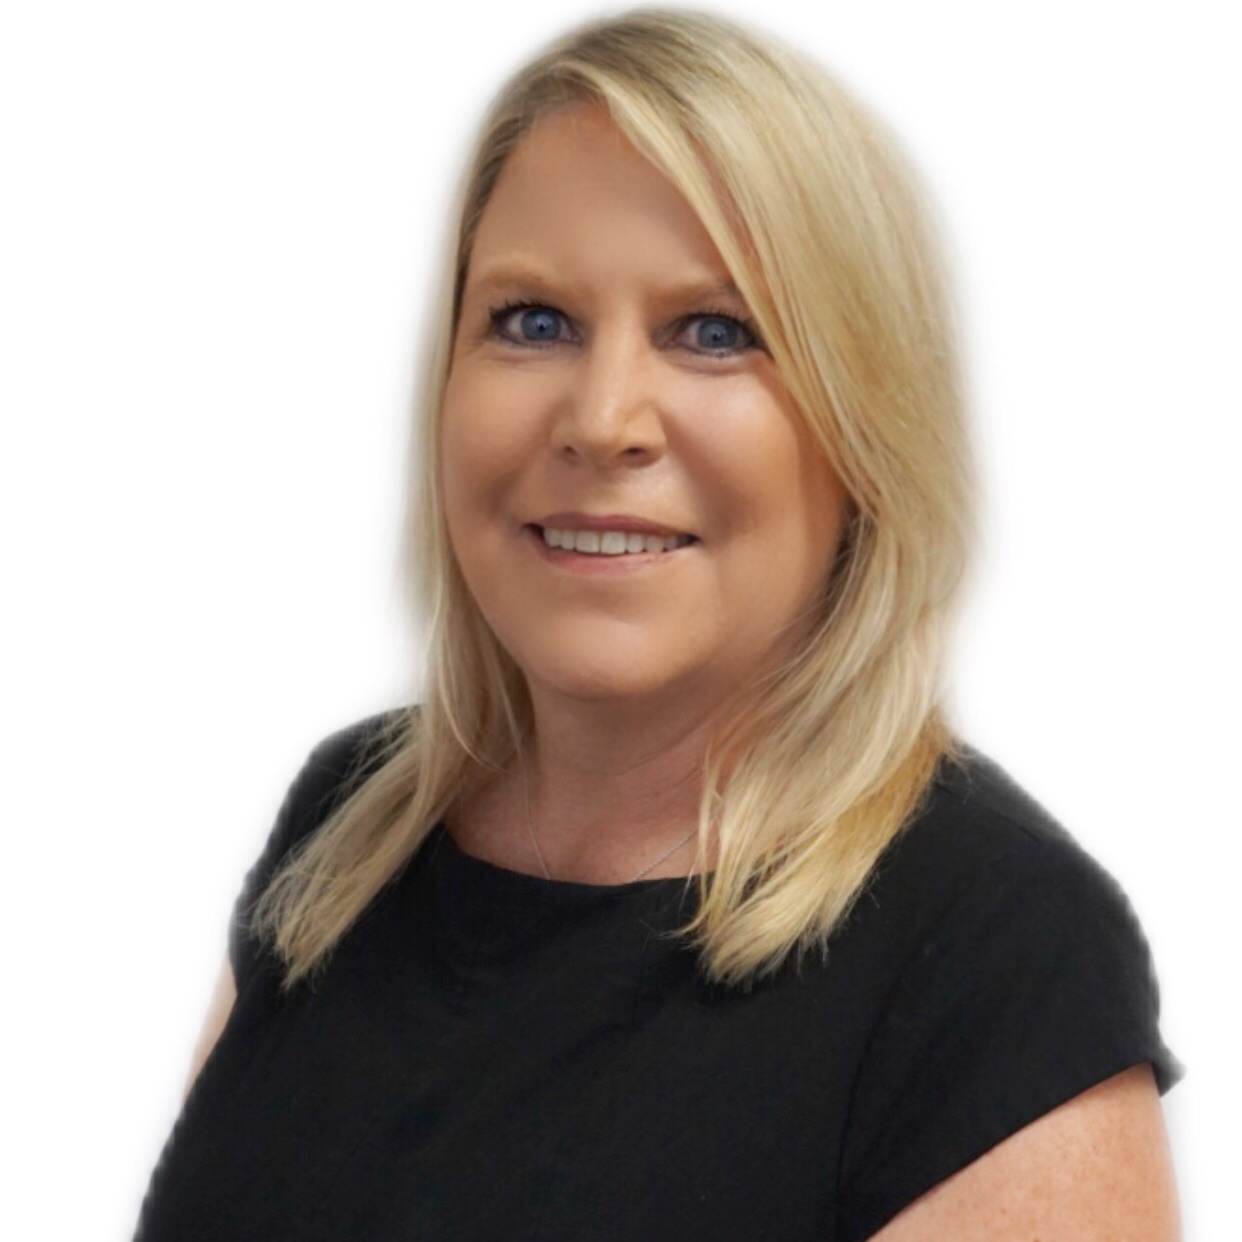 Lisa Croy   lcroy@macgregor-oreilly.com.au